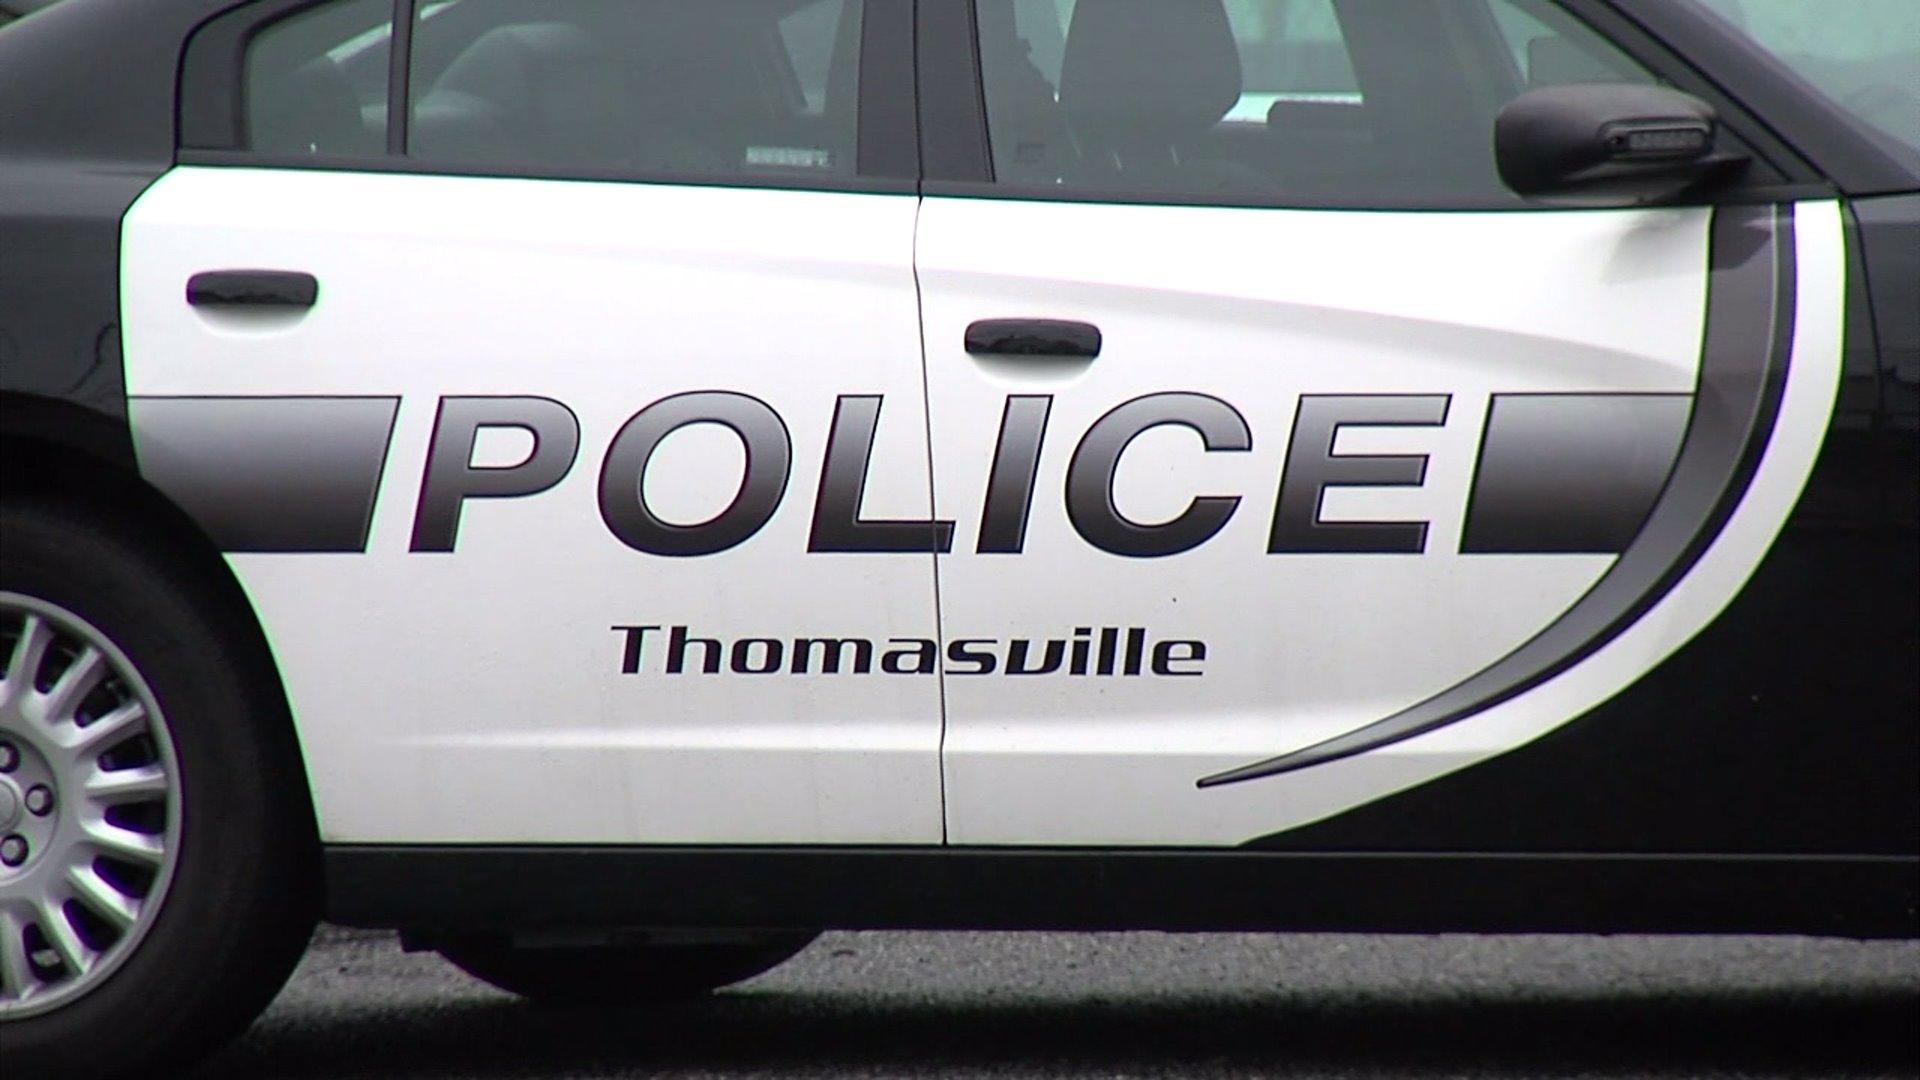 Thomasville police (WGHP file photo)